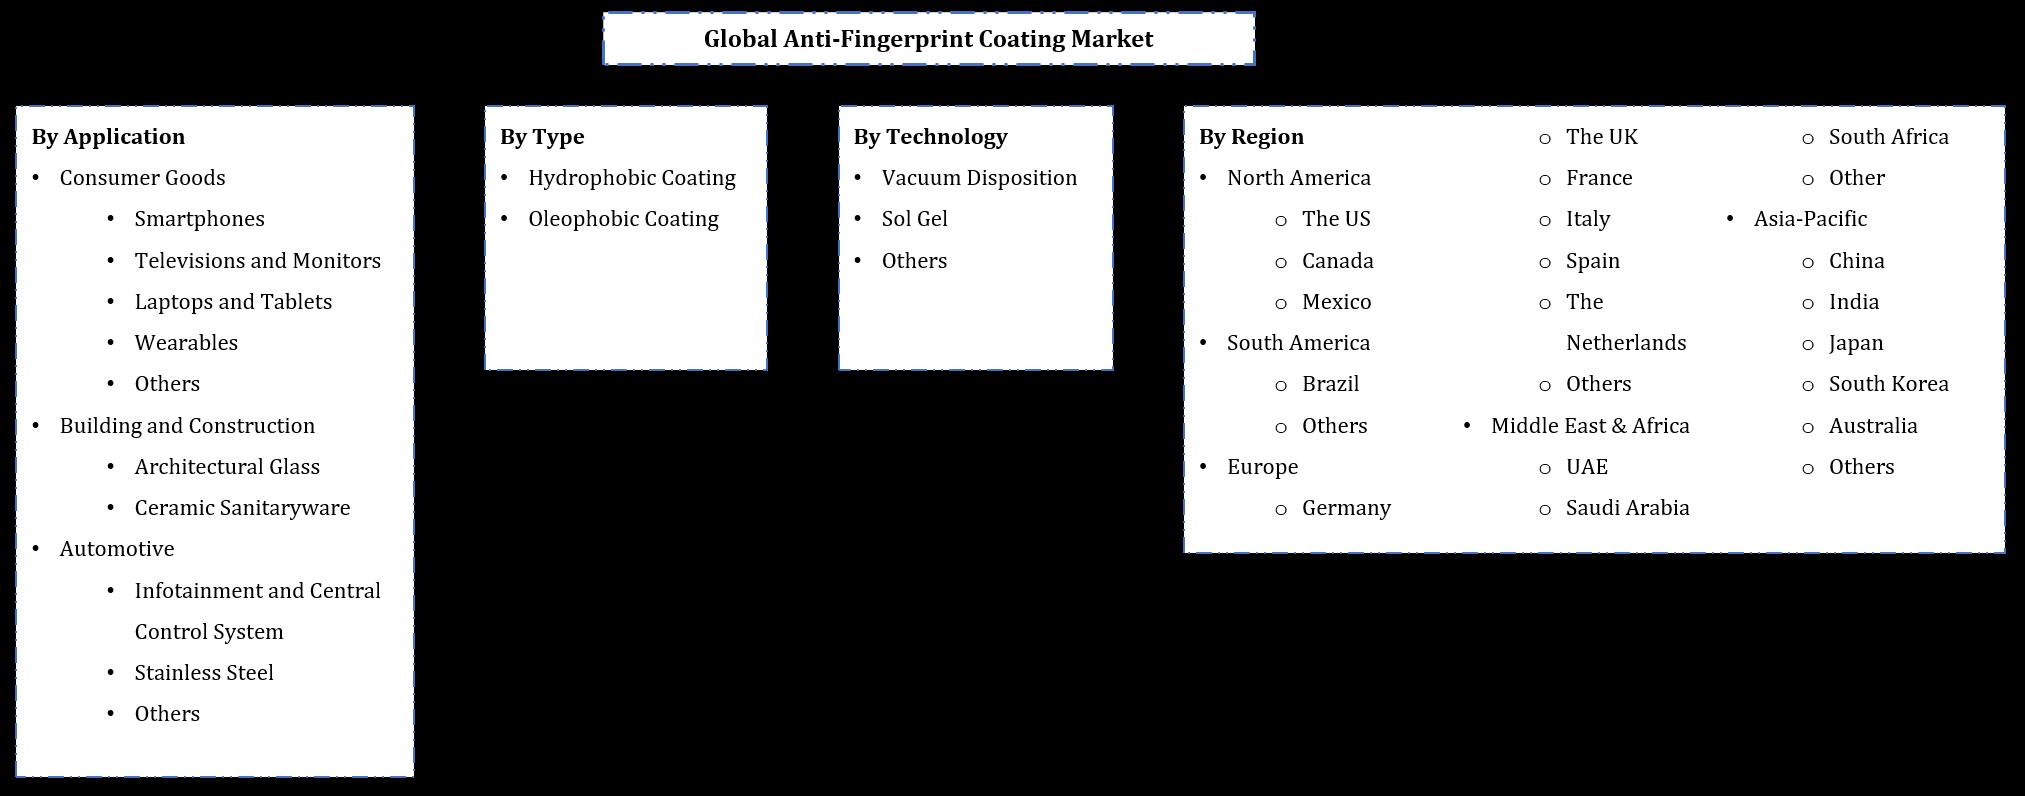 Global Anti Fingerprint Coatings Market Segmentation